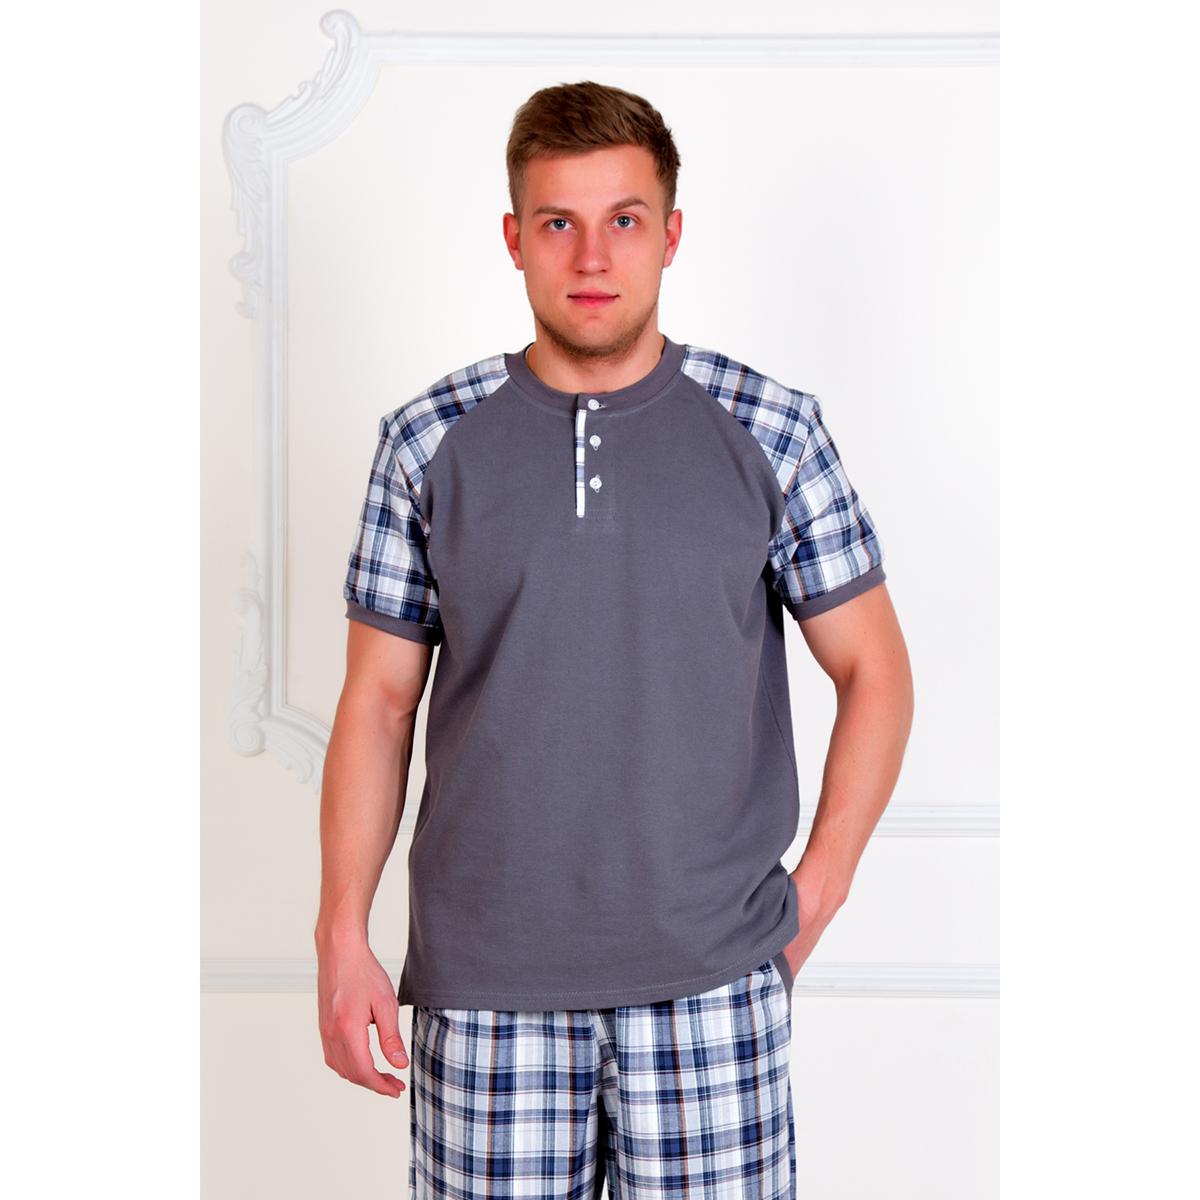 Мужской костюм Аристарх Серый, размер 44Костюмы<br>Обхват груди: 88 см <br>Обхват талии: 78 см <br>Обхват бедер: 94 см <br>Рост: 170-176 см<br><br>Тип: Муж. костюм<br>Размер: 44<br>Материал: Пике